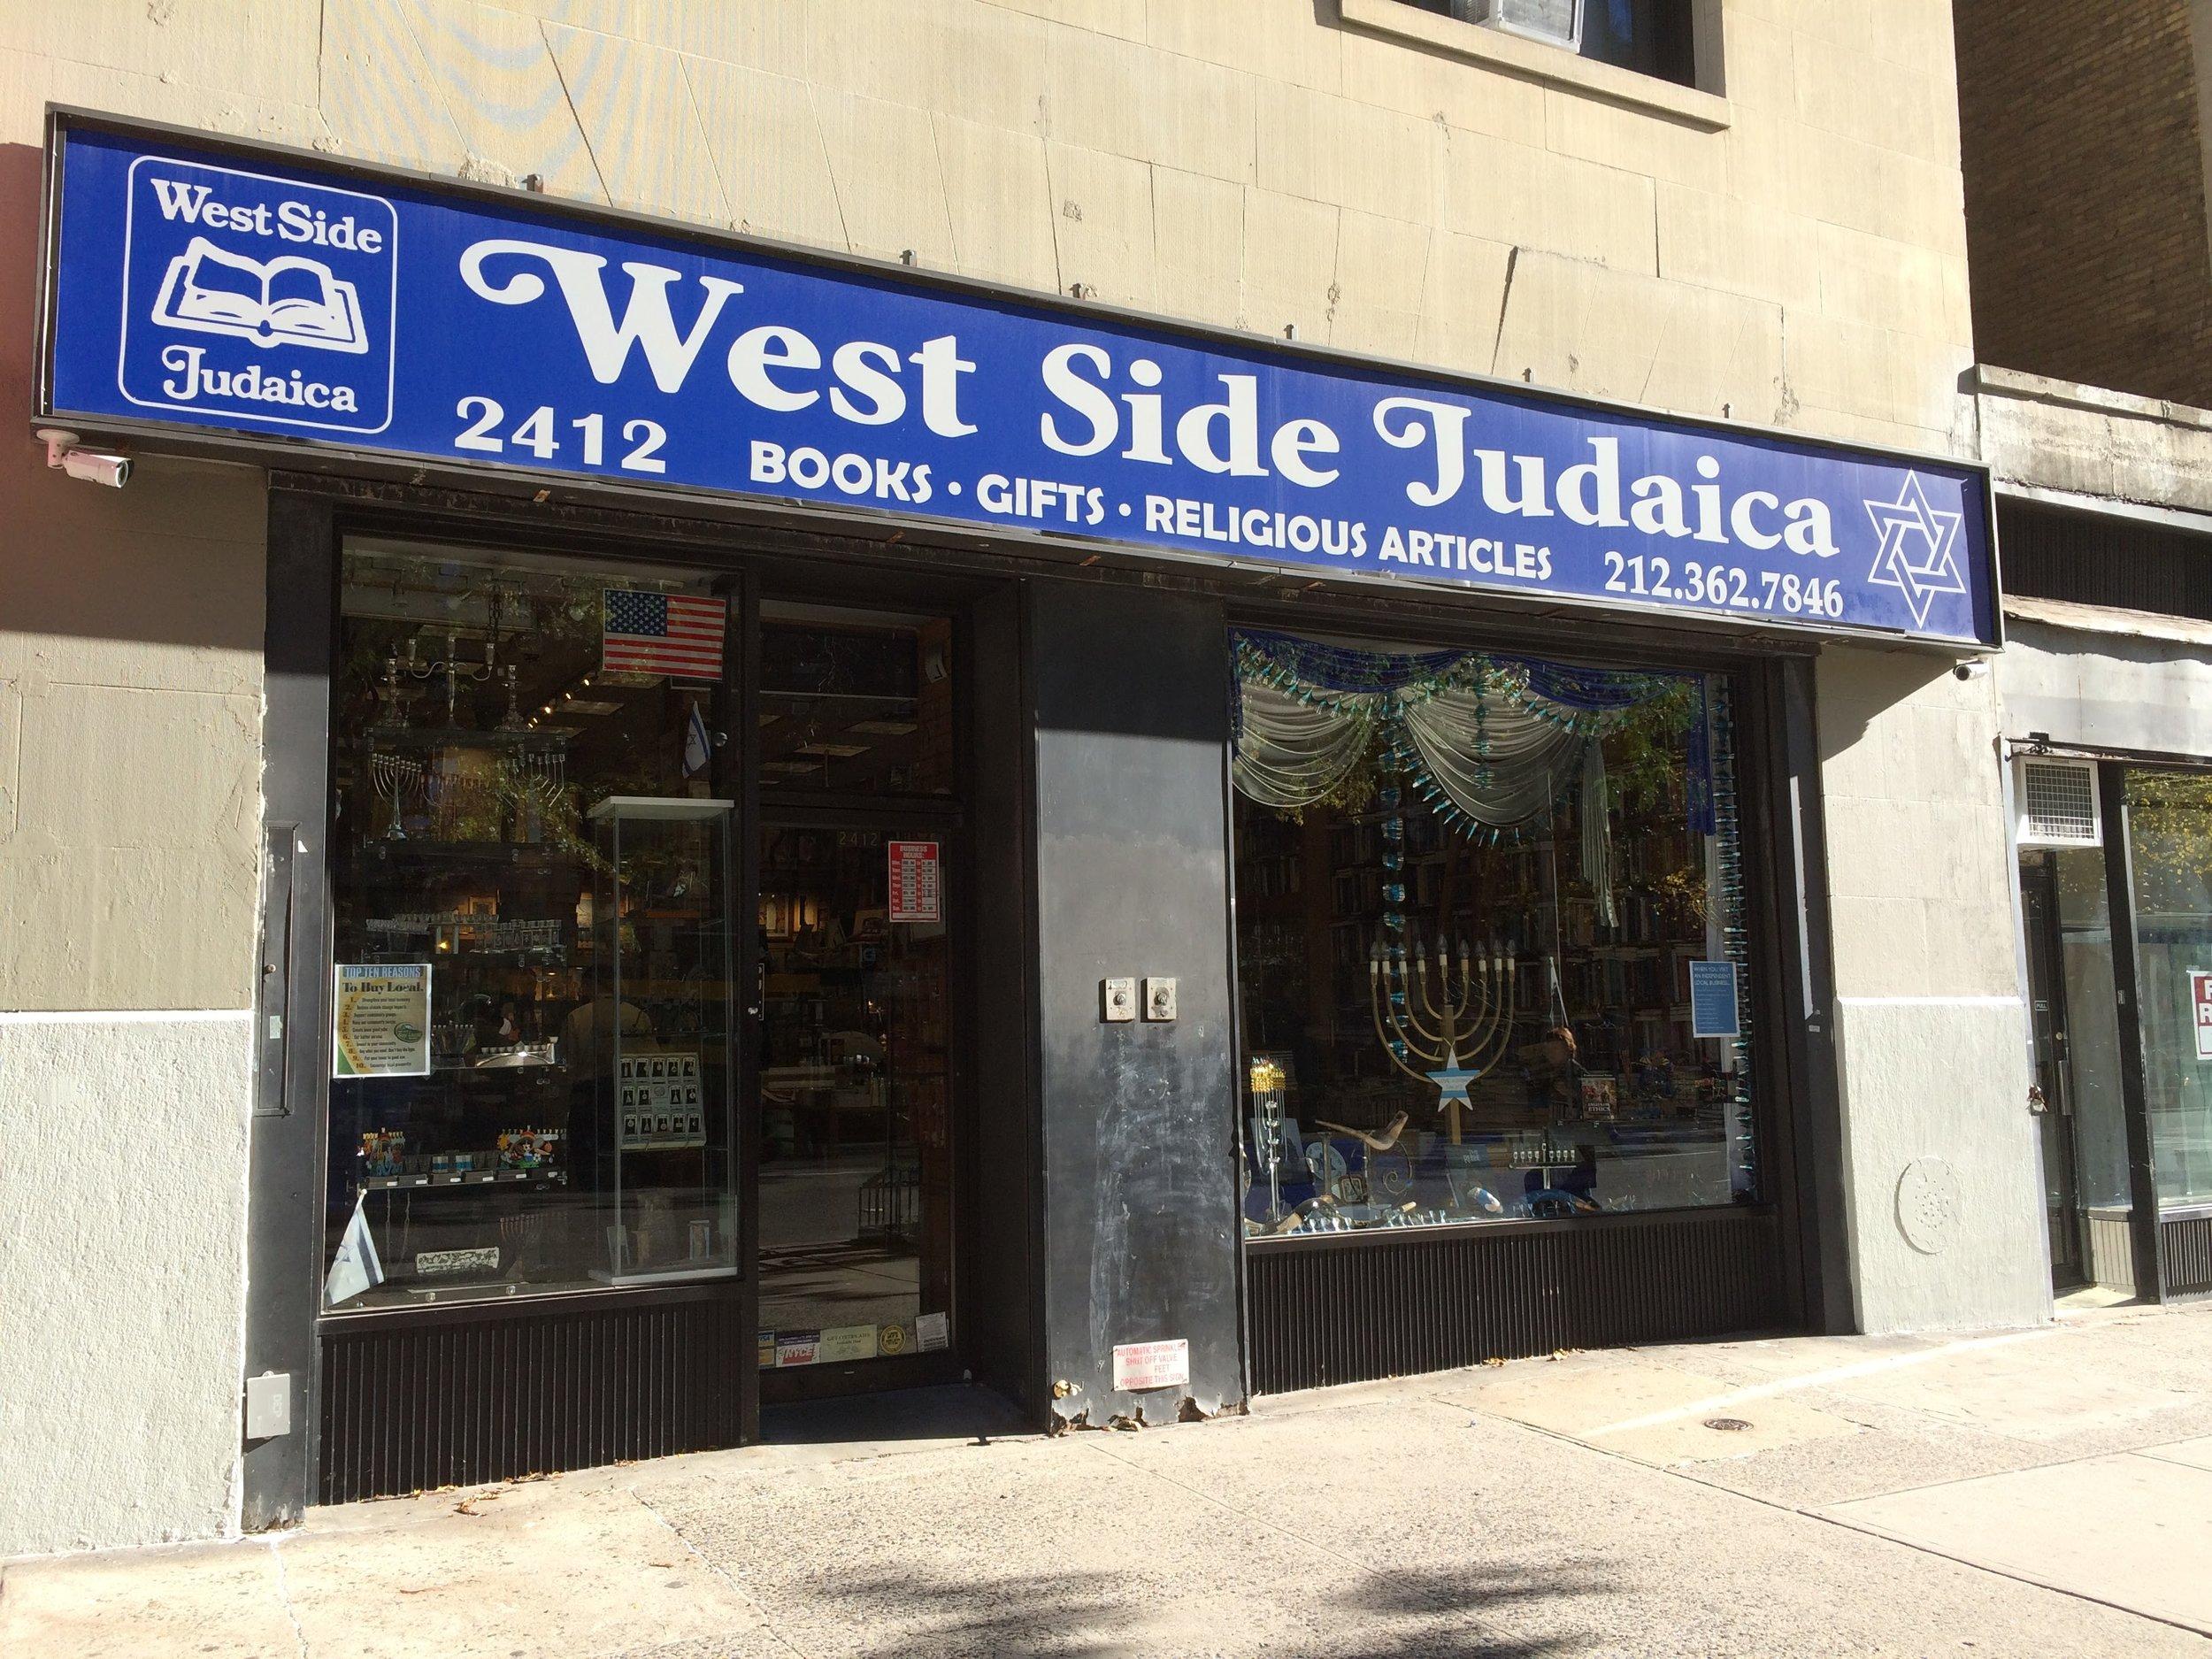 18. West Side Judaica & Bookstore